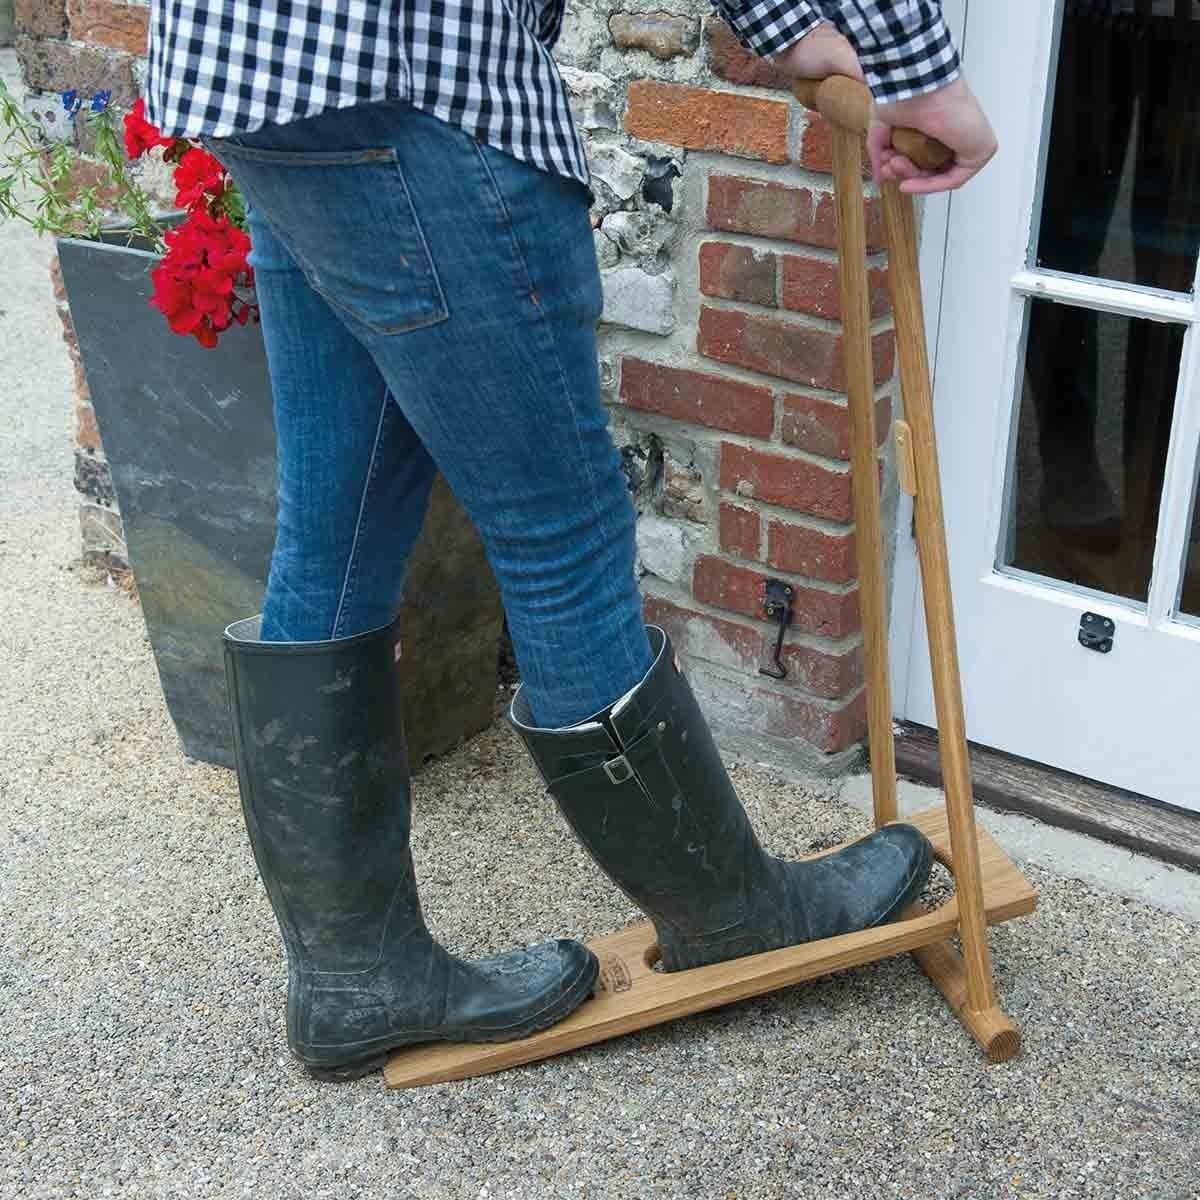 Upright Folding Oak Boot Jack The Present Finder